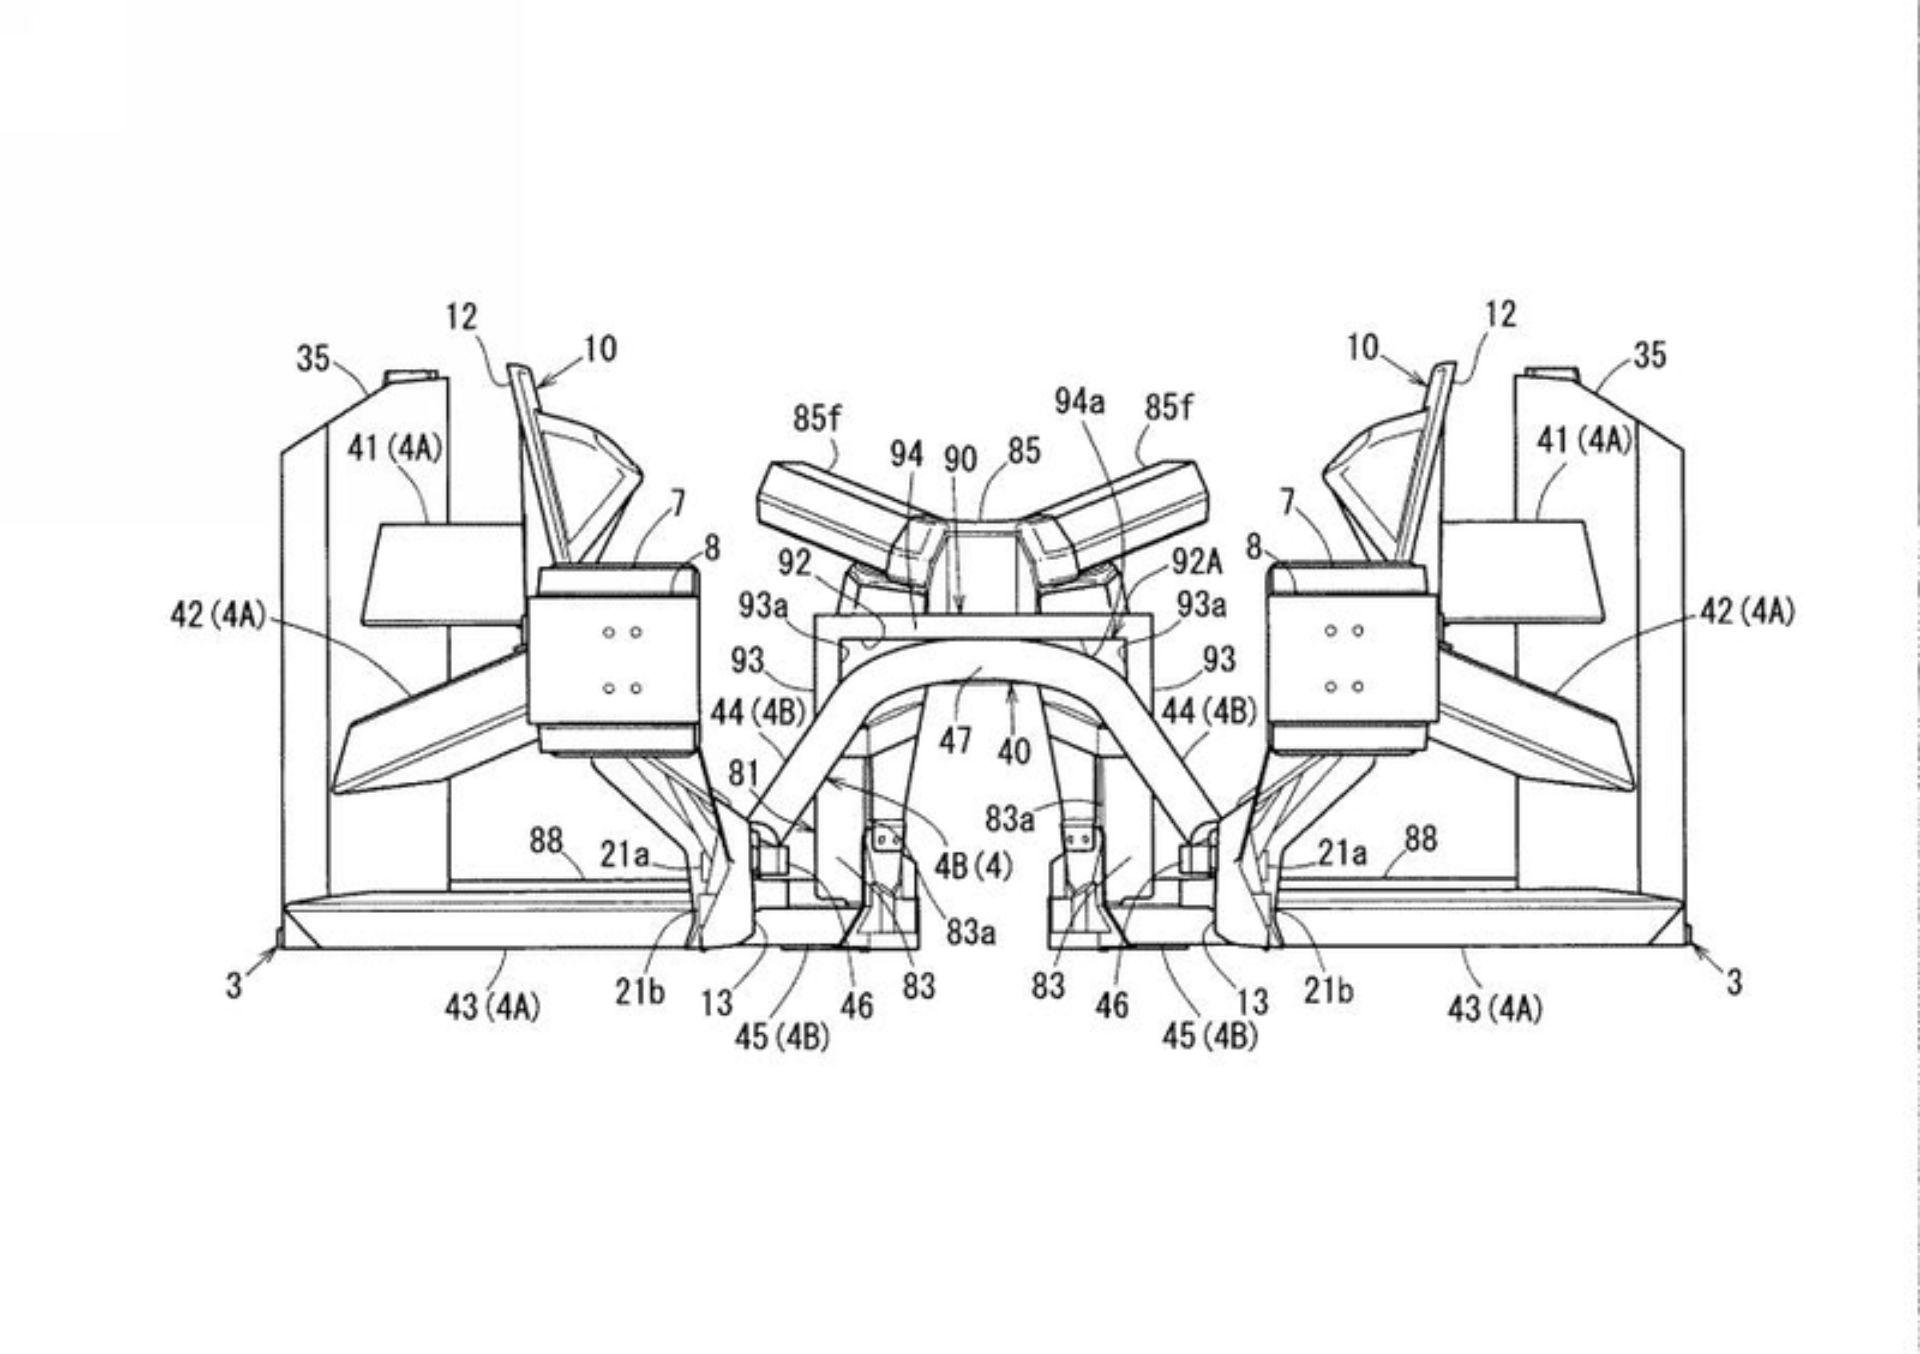 Mazda-Structure-patent-filing-11